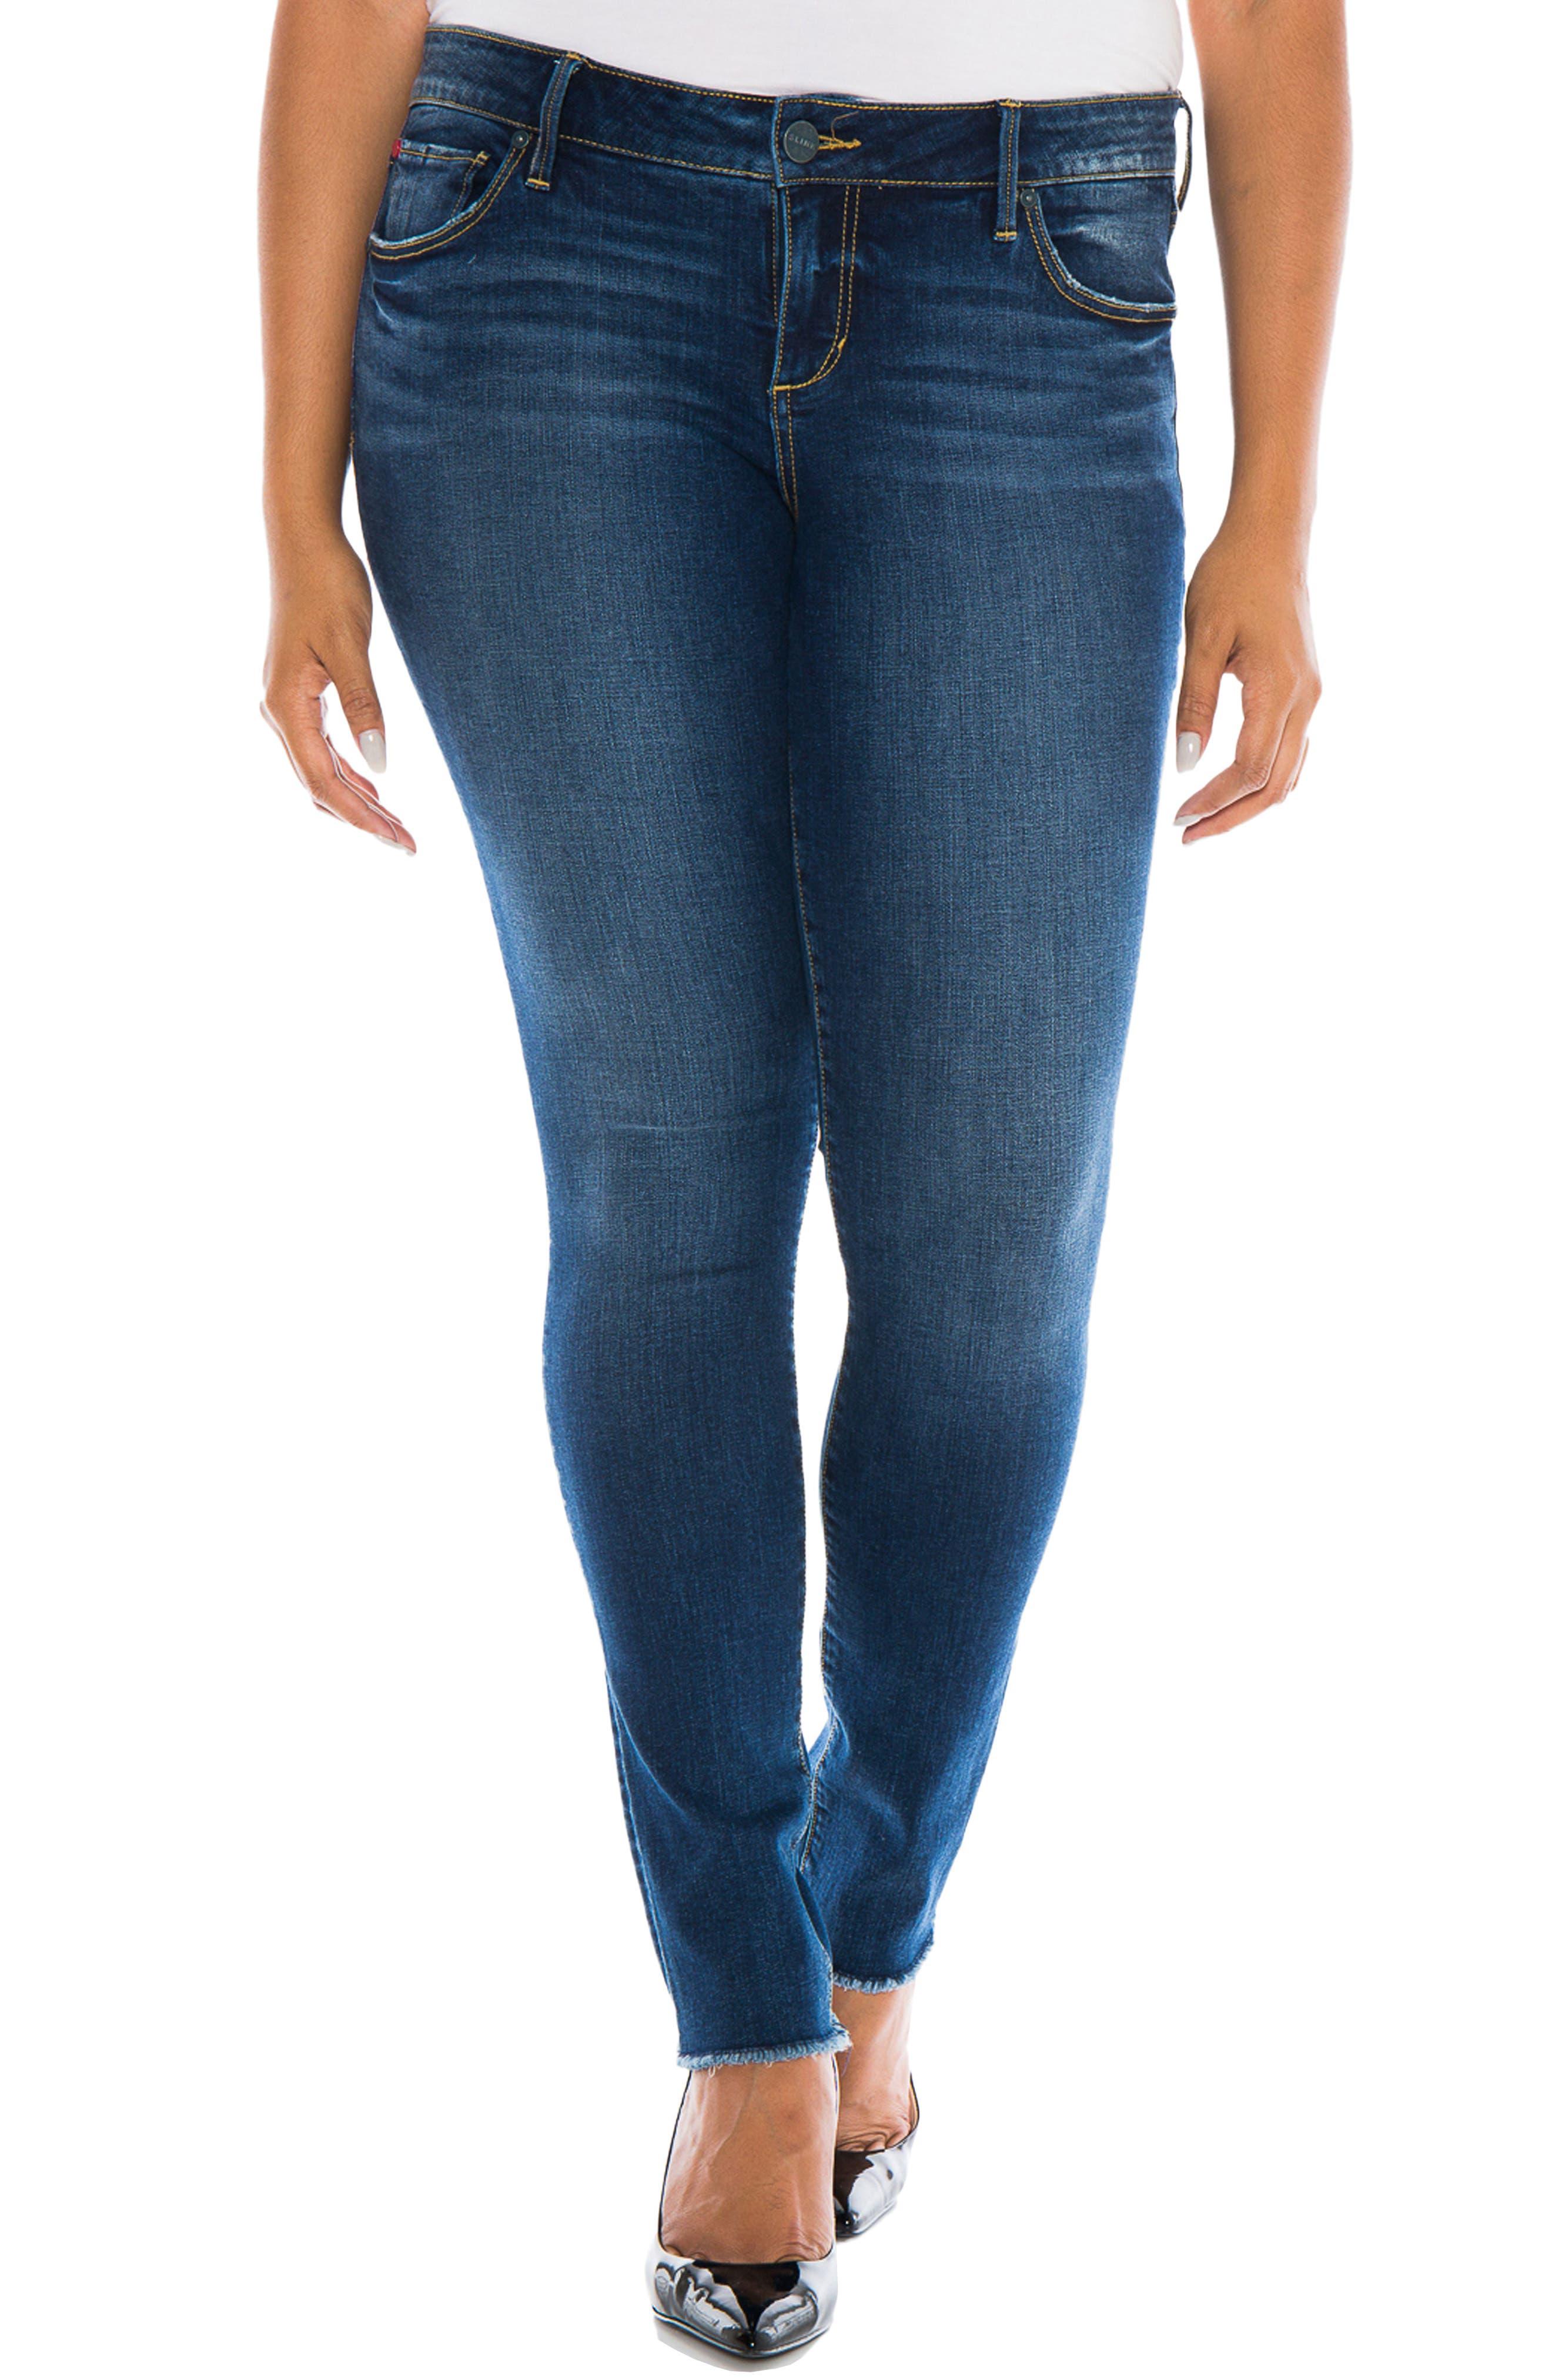 SLINK Jeans Raw Hem Skinny Jeans (Charvelle) (Plus Size)